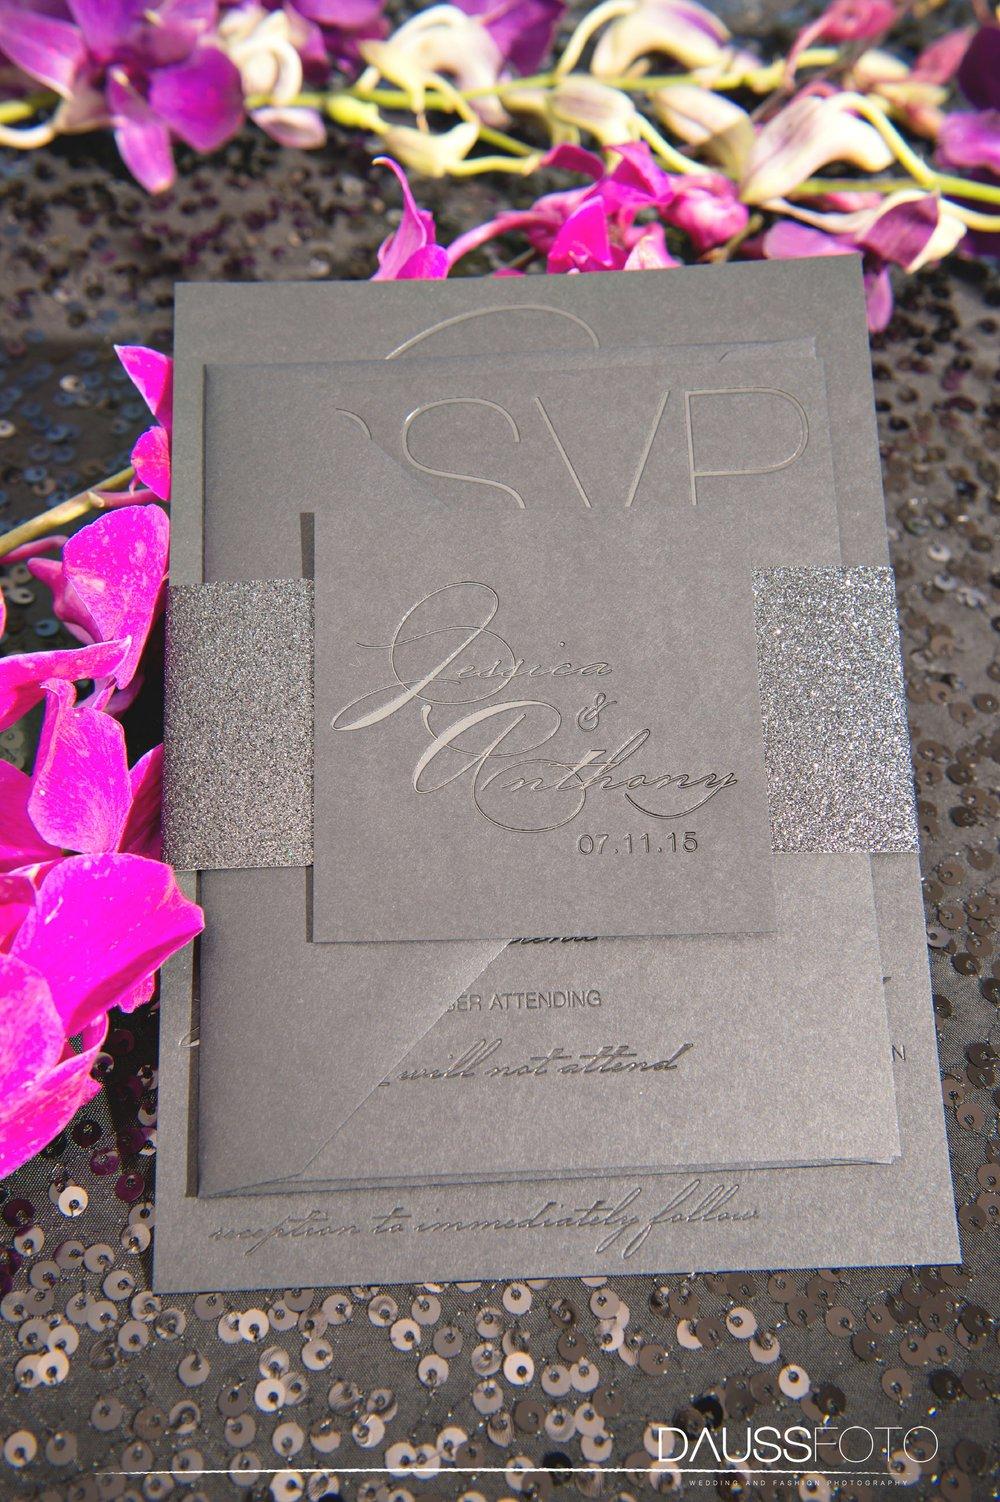 DaussFOTO_20150721_005_Indiana Wedding Photographer.jpg